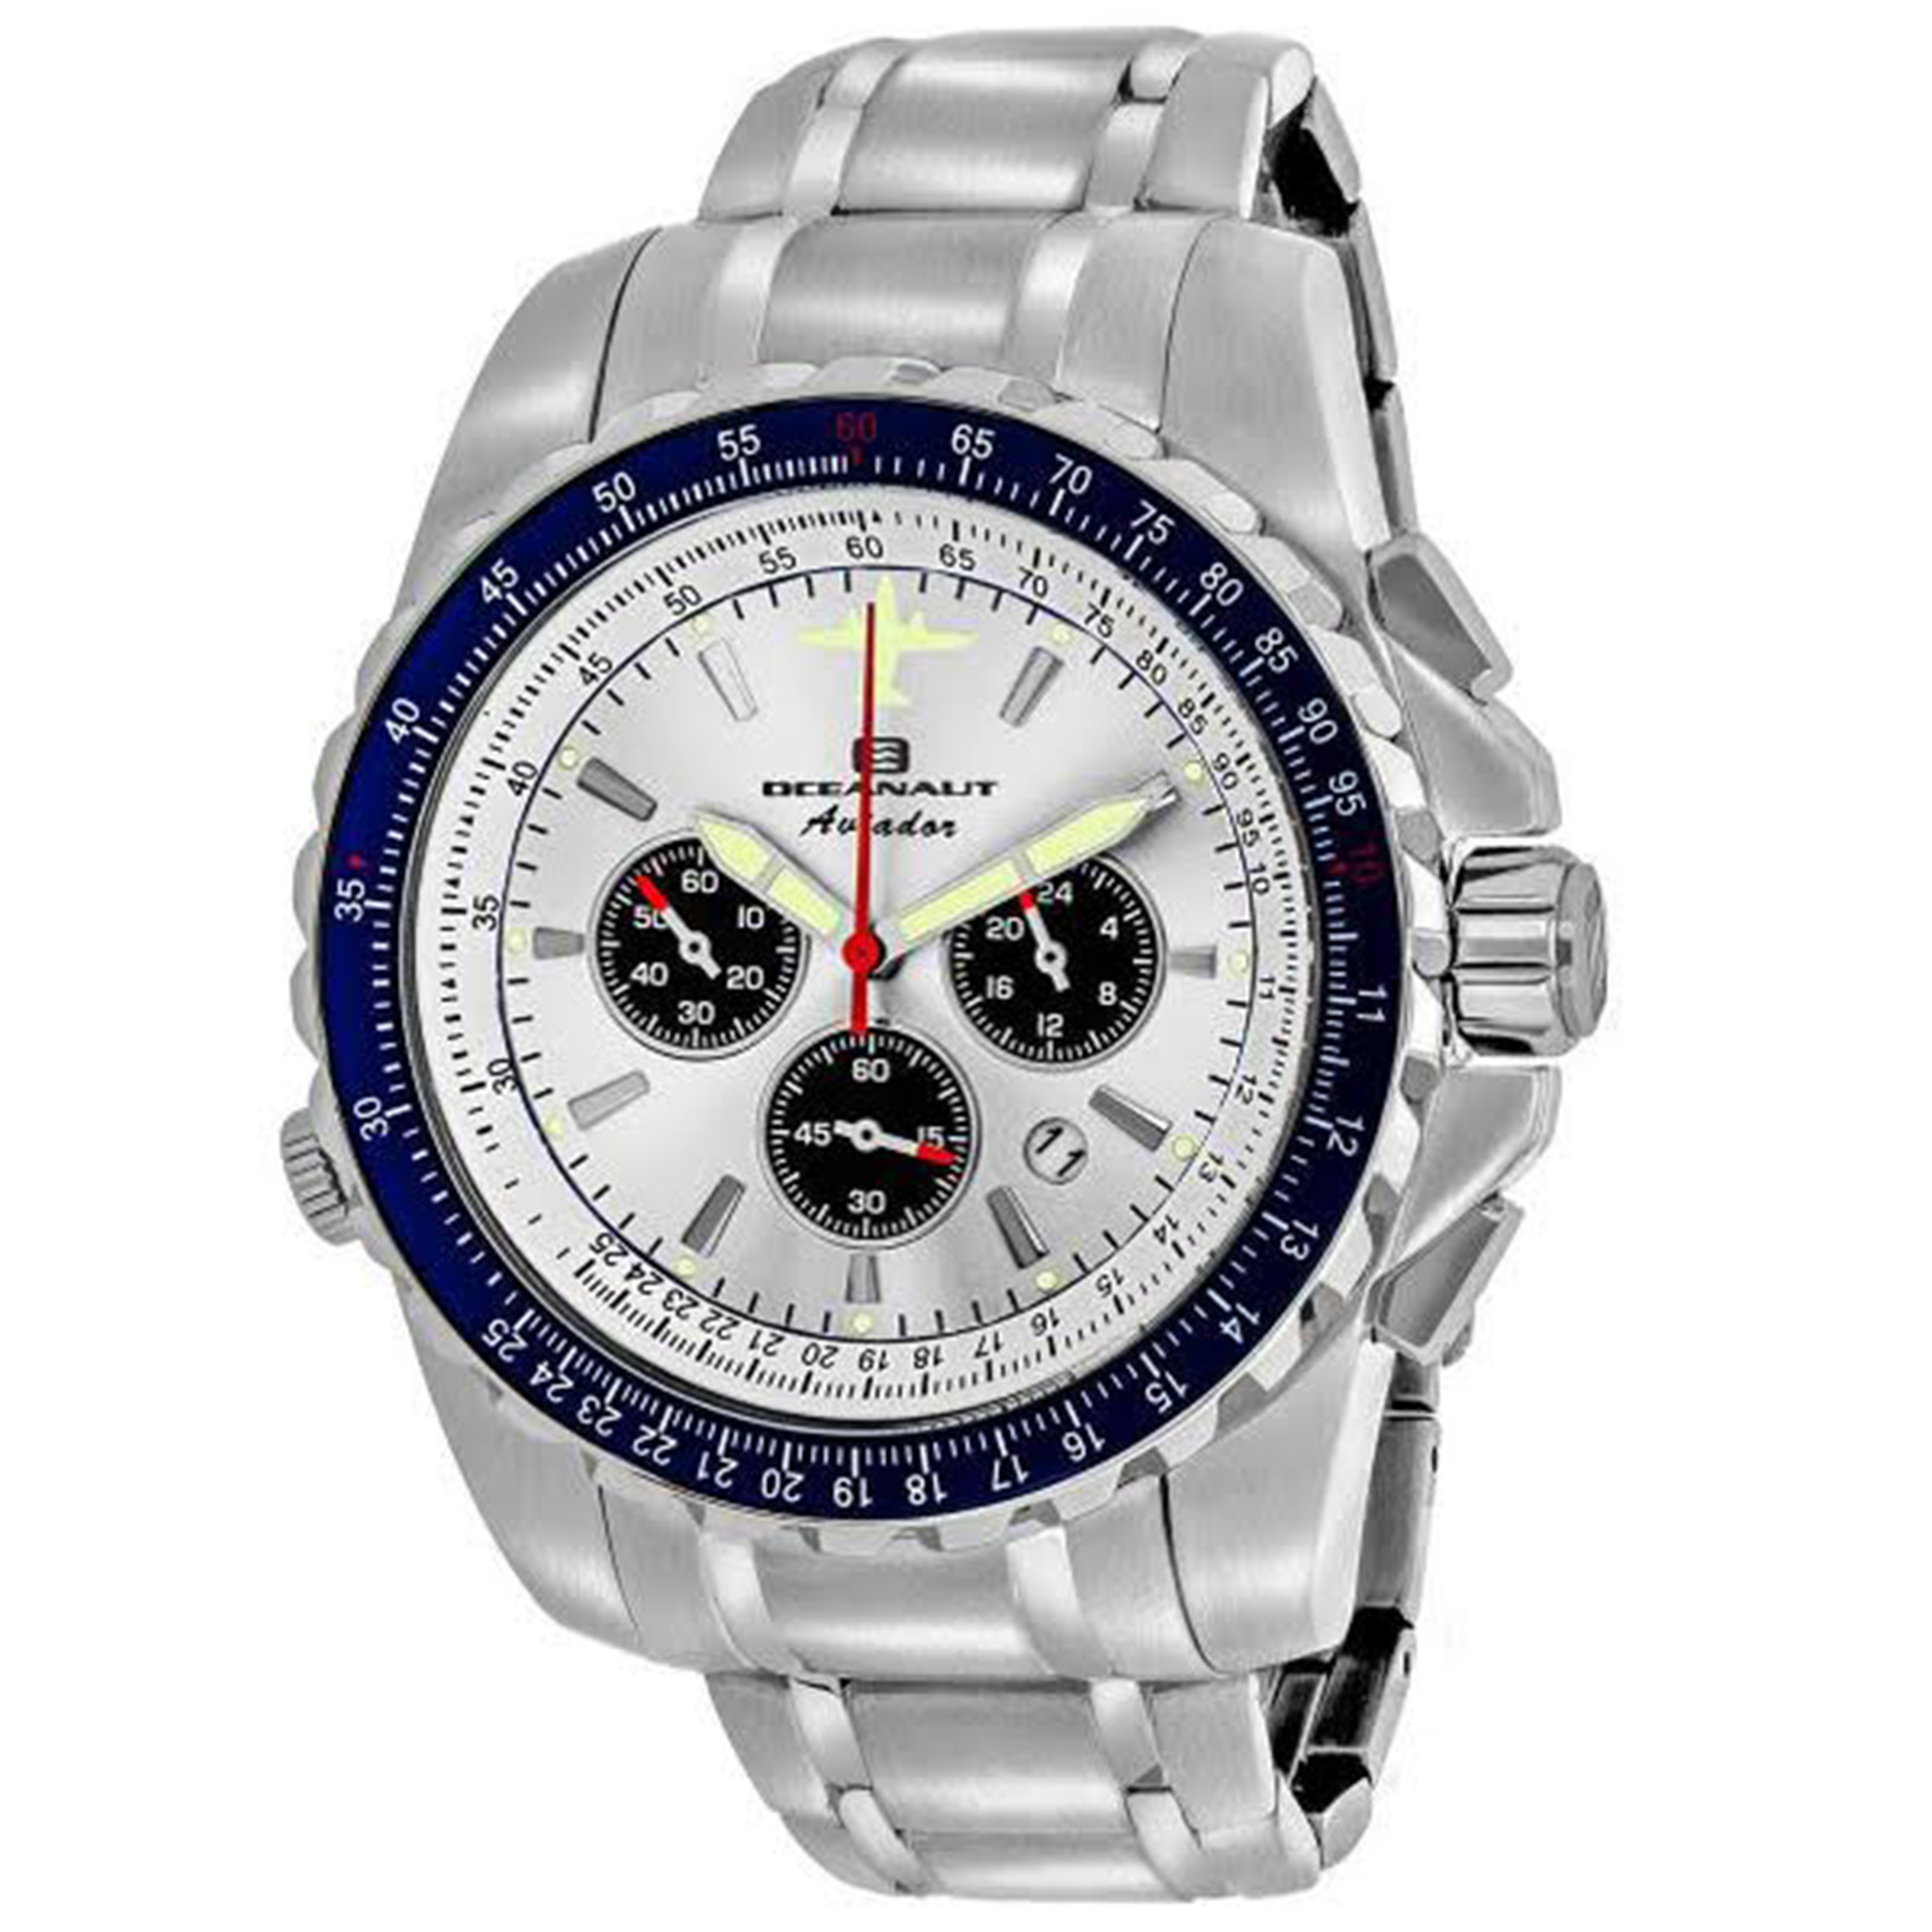 Oceanaut OC0110-SE_SLV_BLU Oceanaut Special Edition Aviador Chronograph Silver Dial Blue Bezel